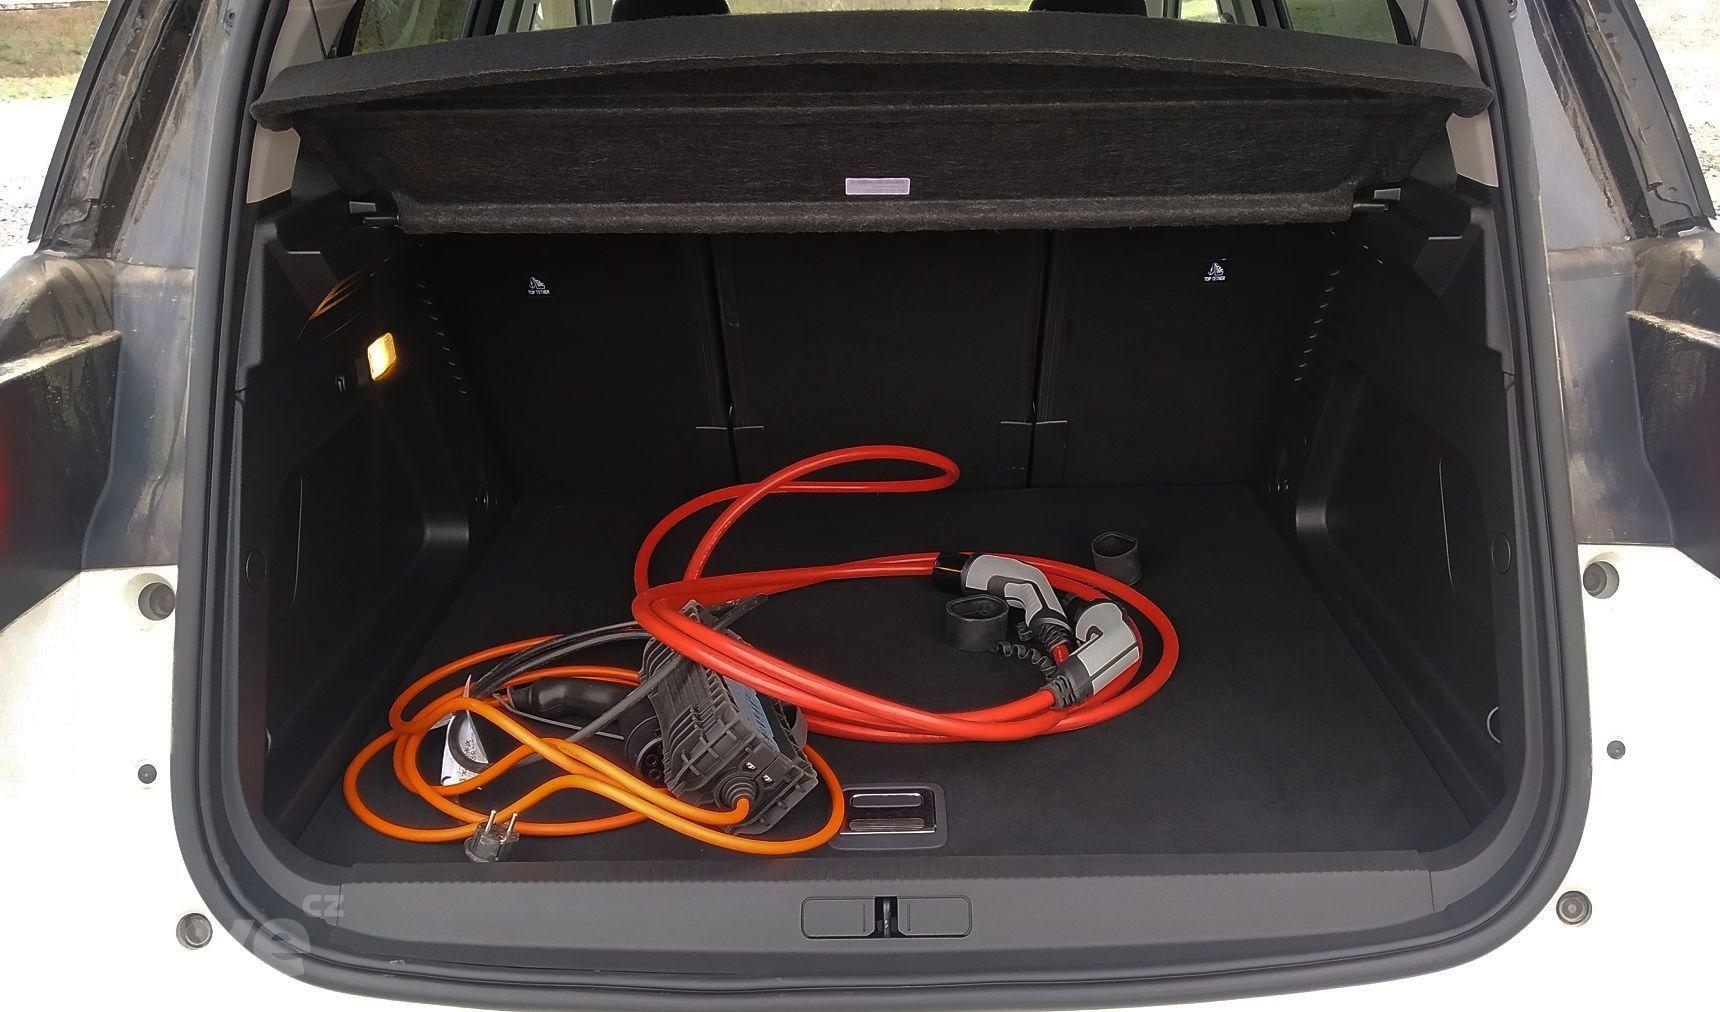 Citroën C5 Aircross Plug-in hybrid